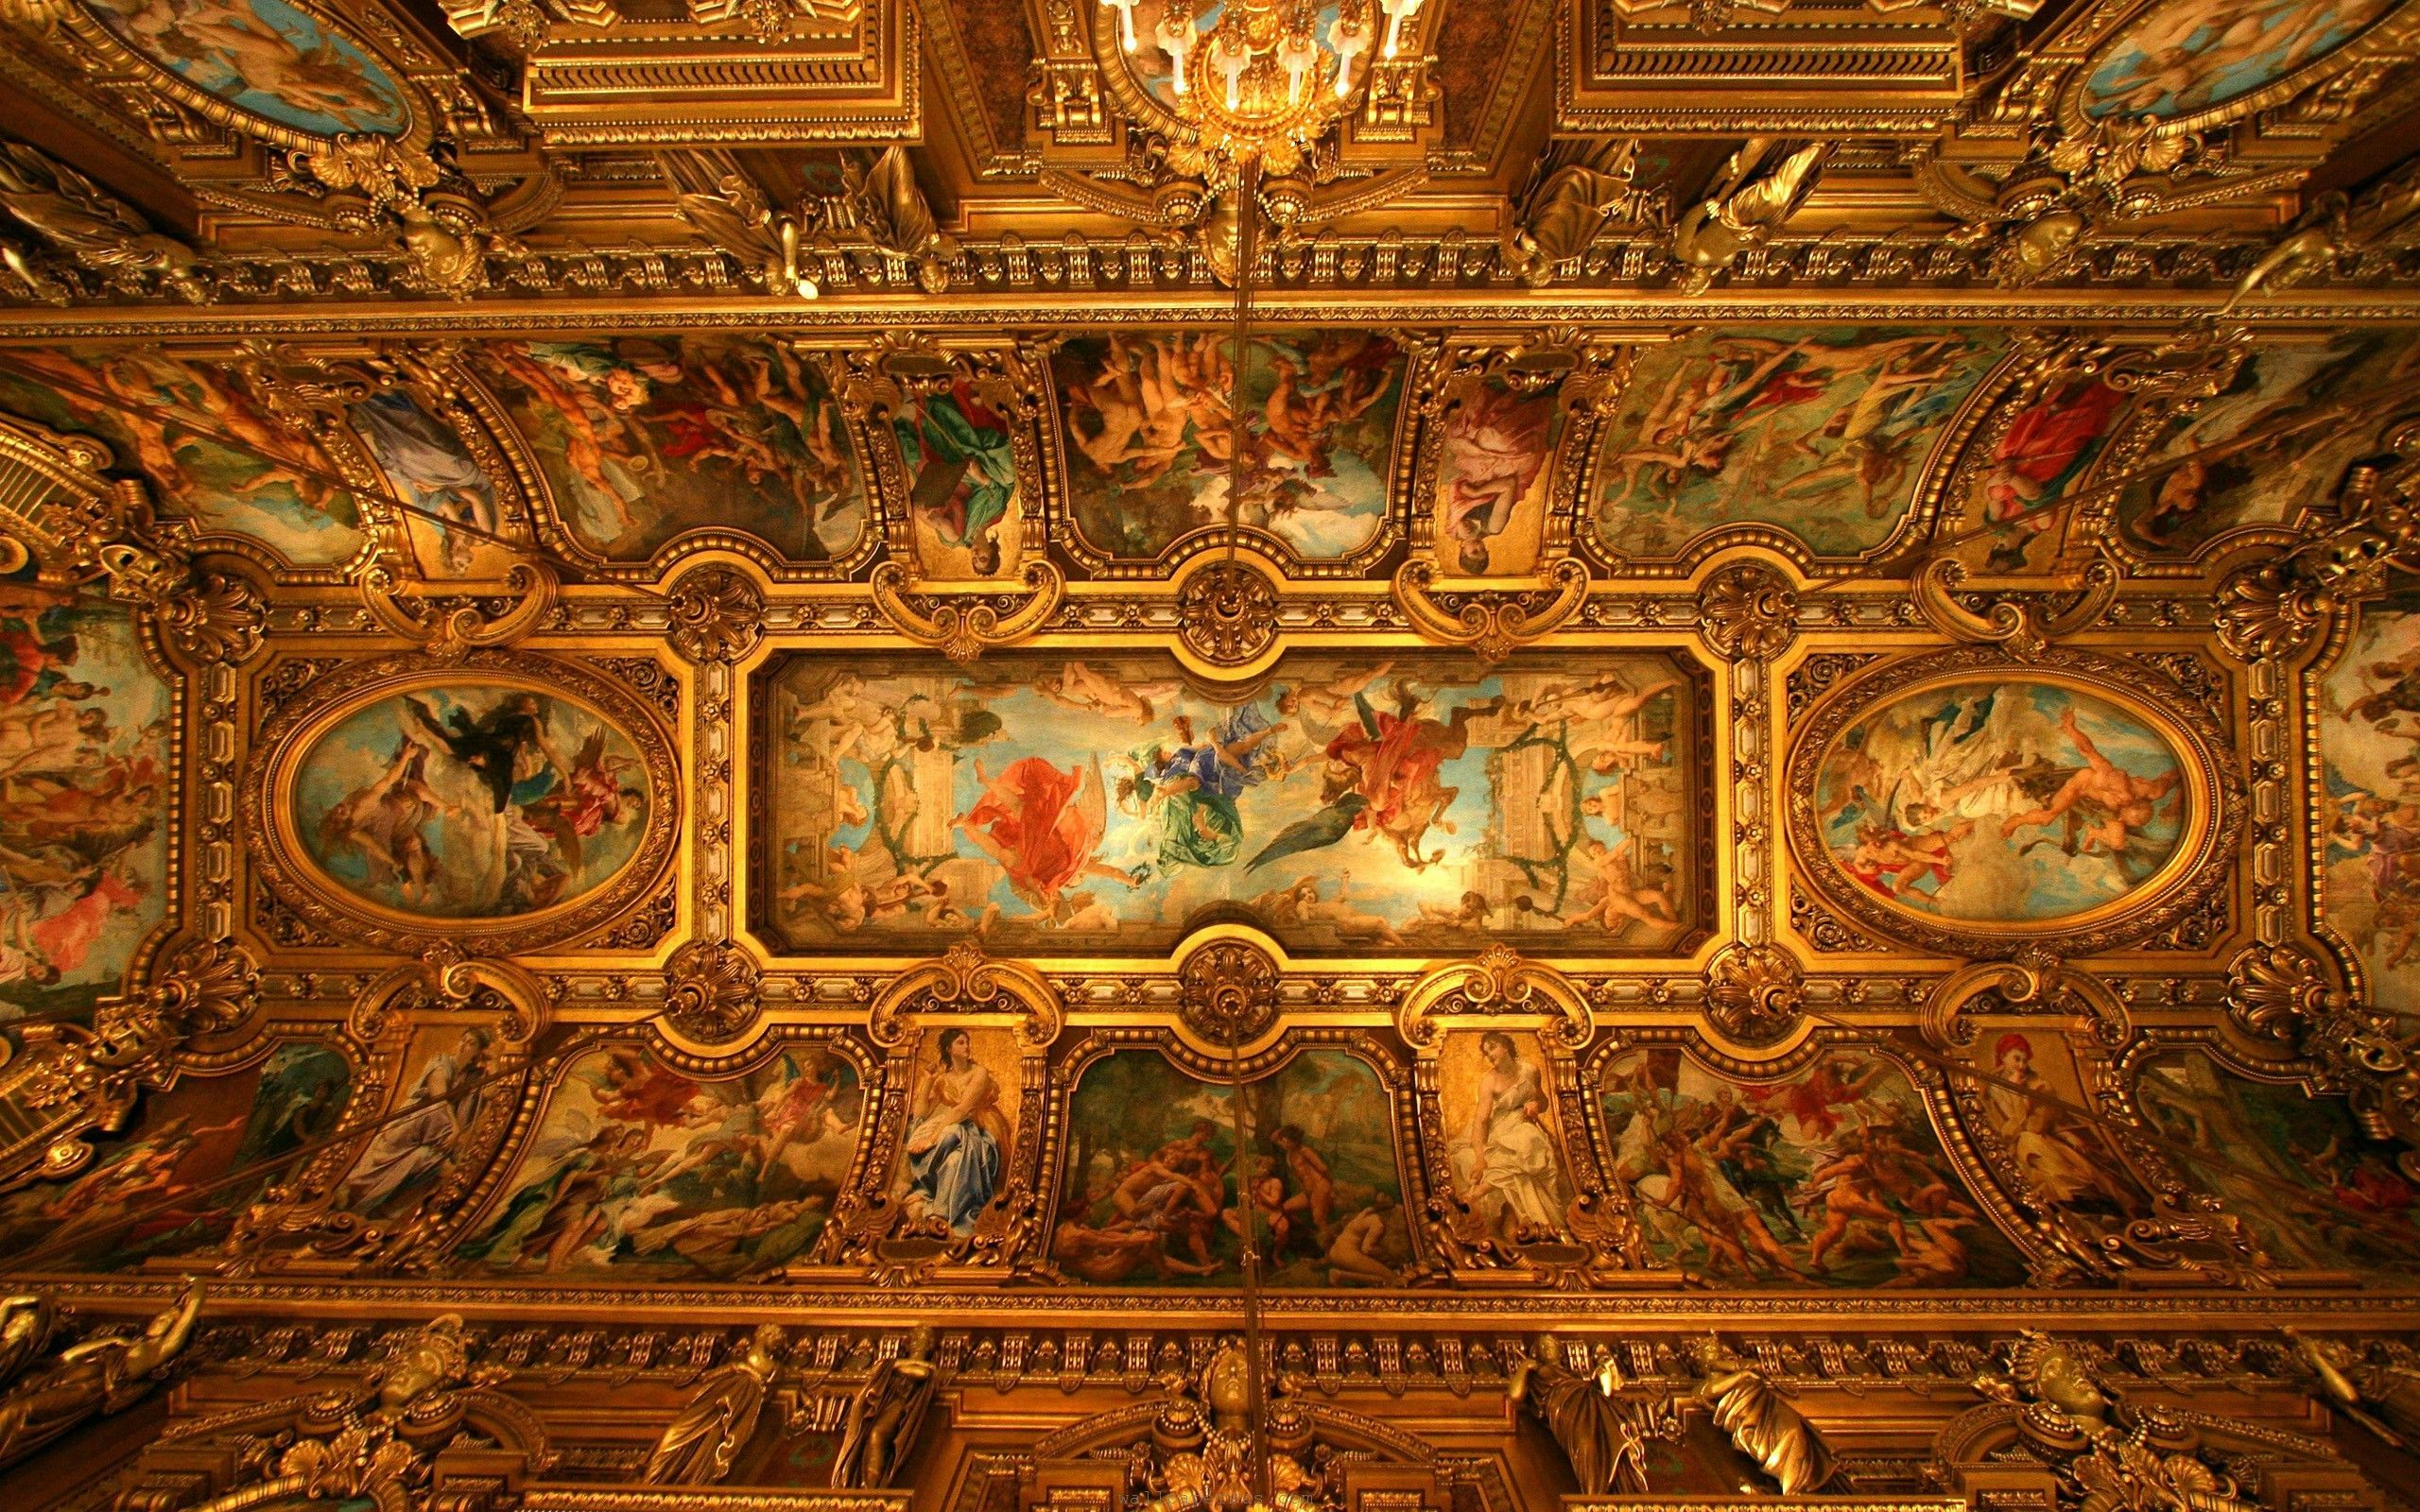 Renaissance Art Desktop Wallpapers - Top Free Renaissance Art Desktop  Backgrounds - WallpaperAccess